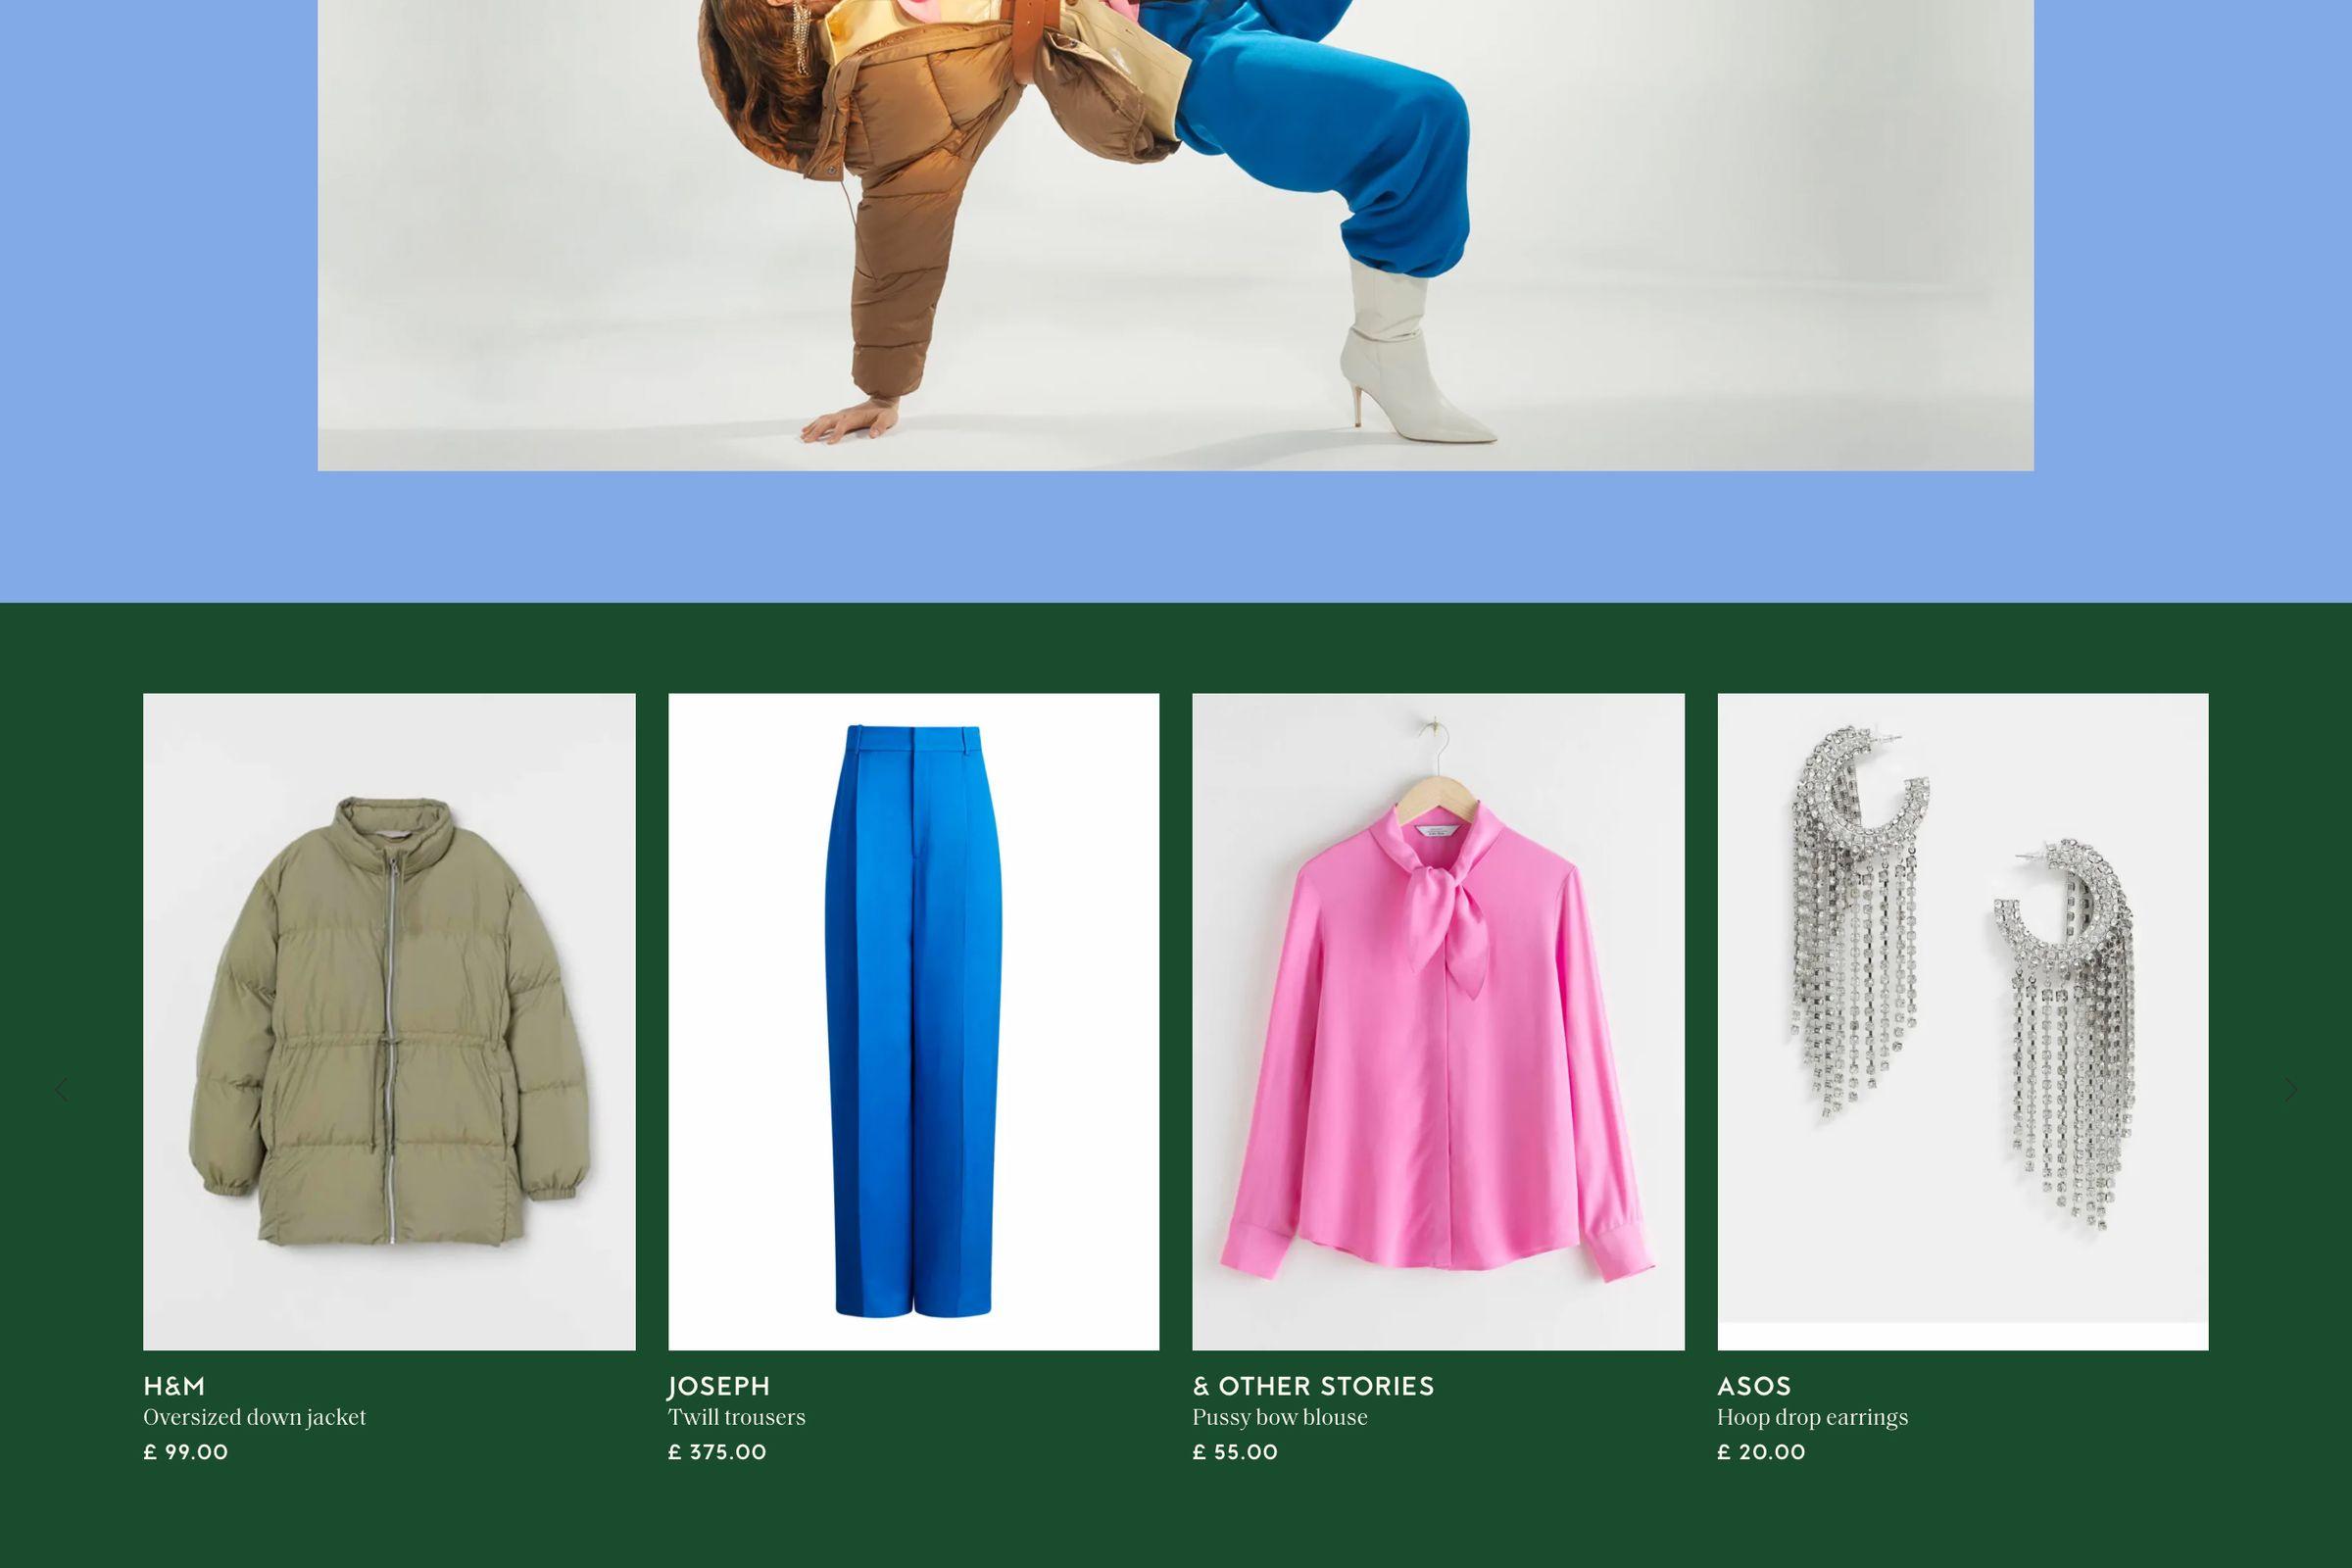 Collagerie website design shop the shoot